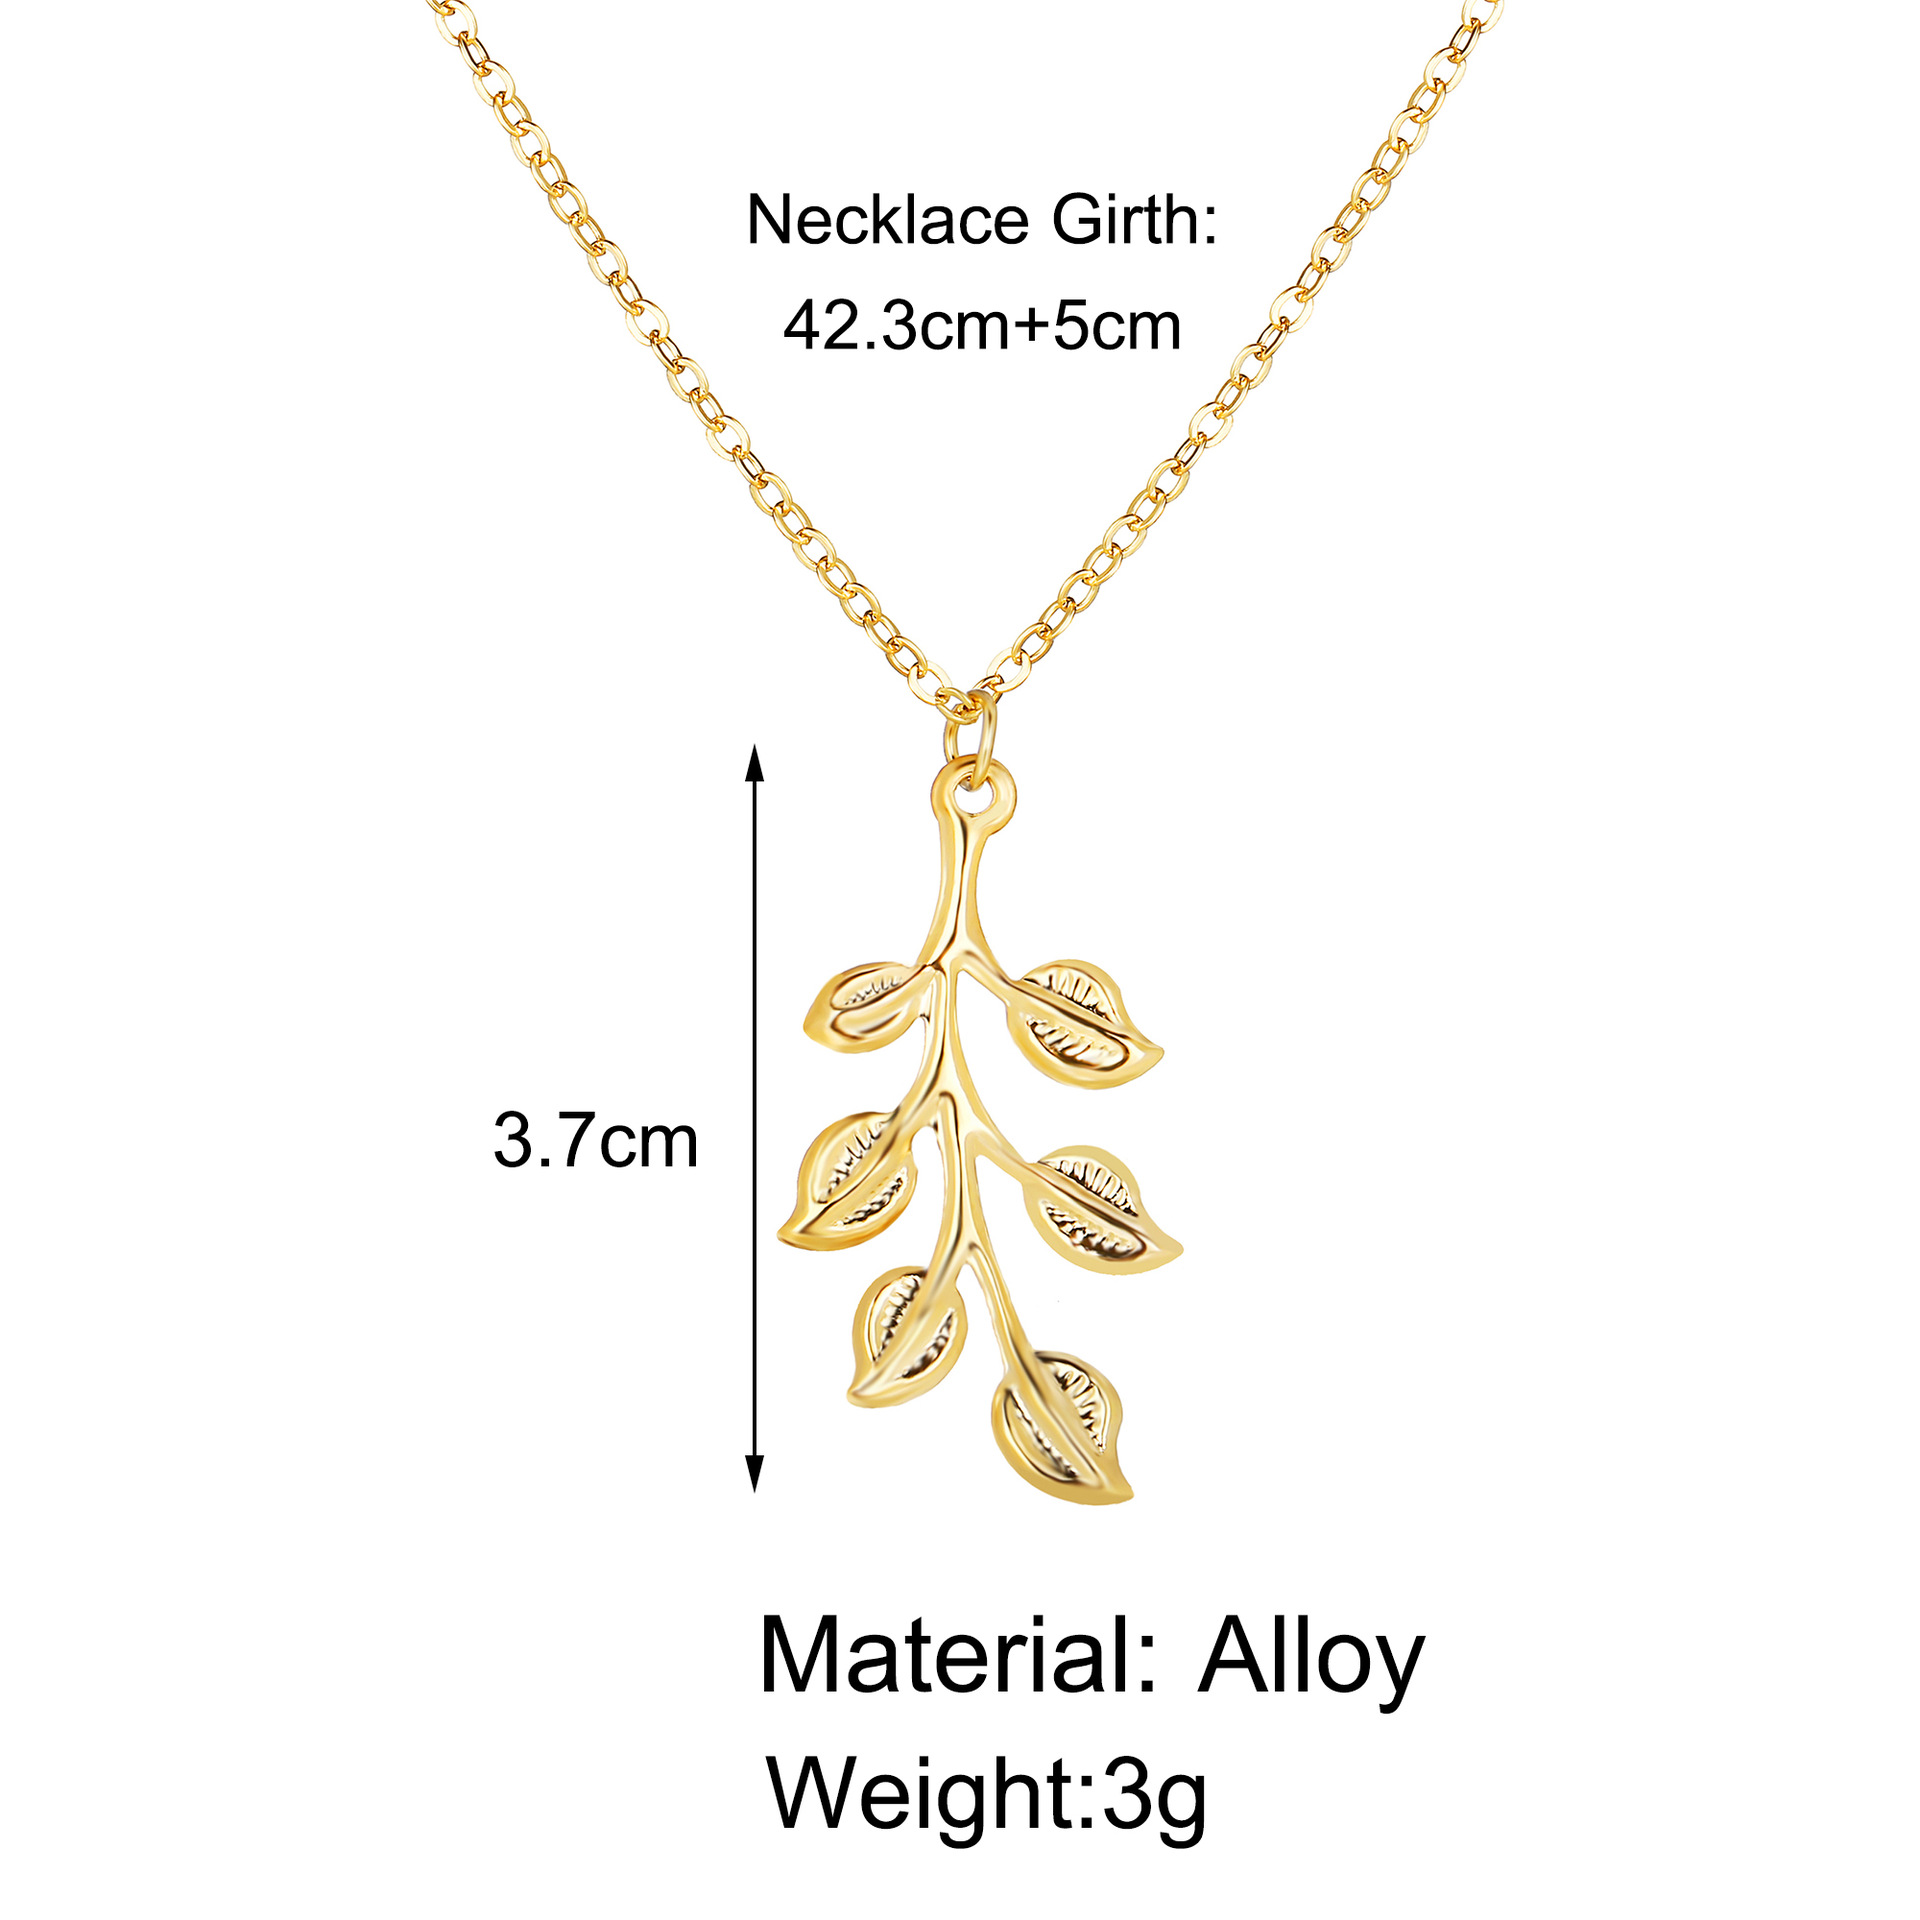 New leaf pendant long necklace clavicle chain NHPJ173180